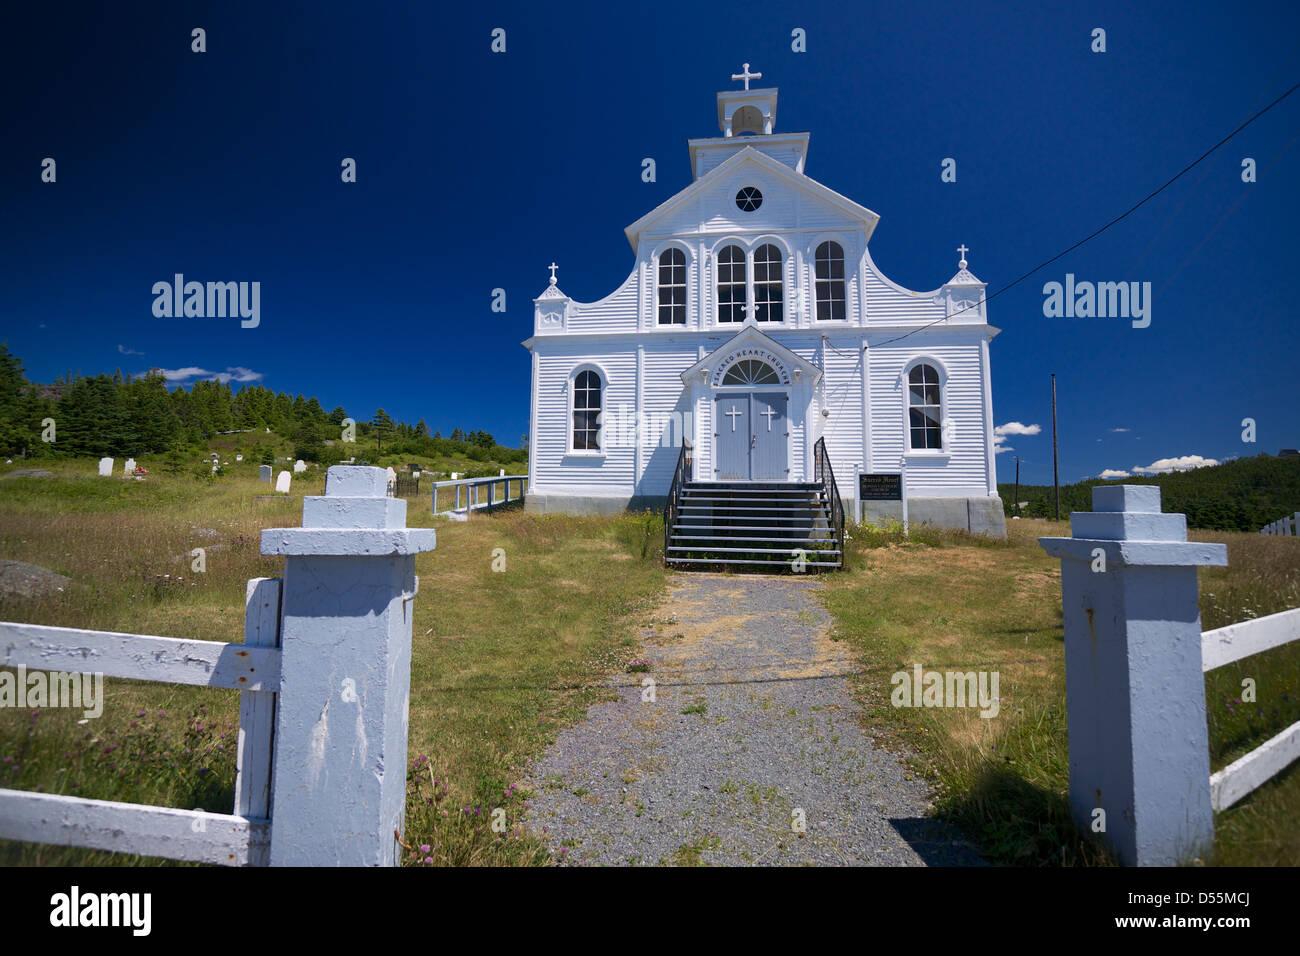 Sacred Heart Roman Catholic Church (Exterior) Open Hall, Bonavista Bay, Newfoundland. - Stock Image